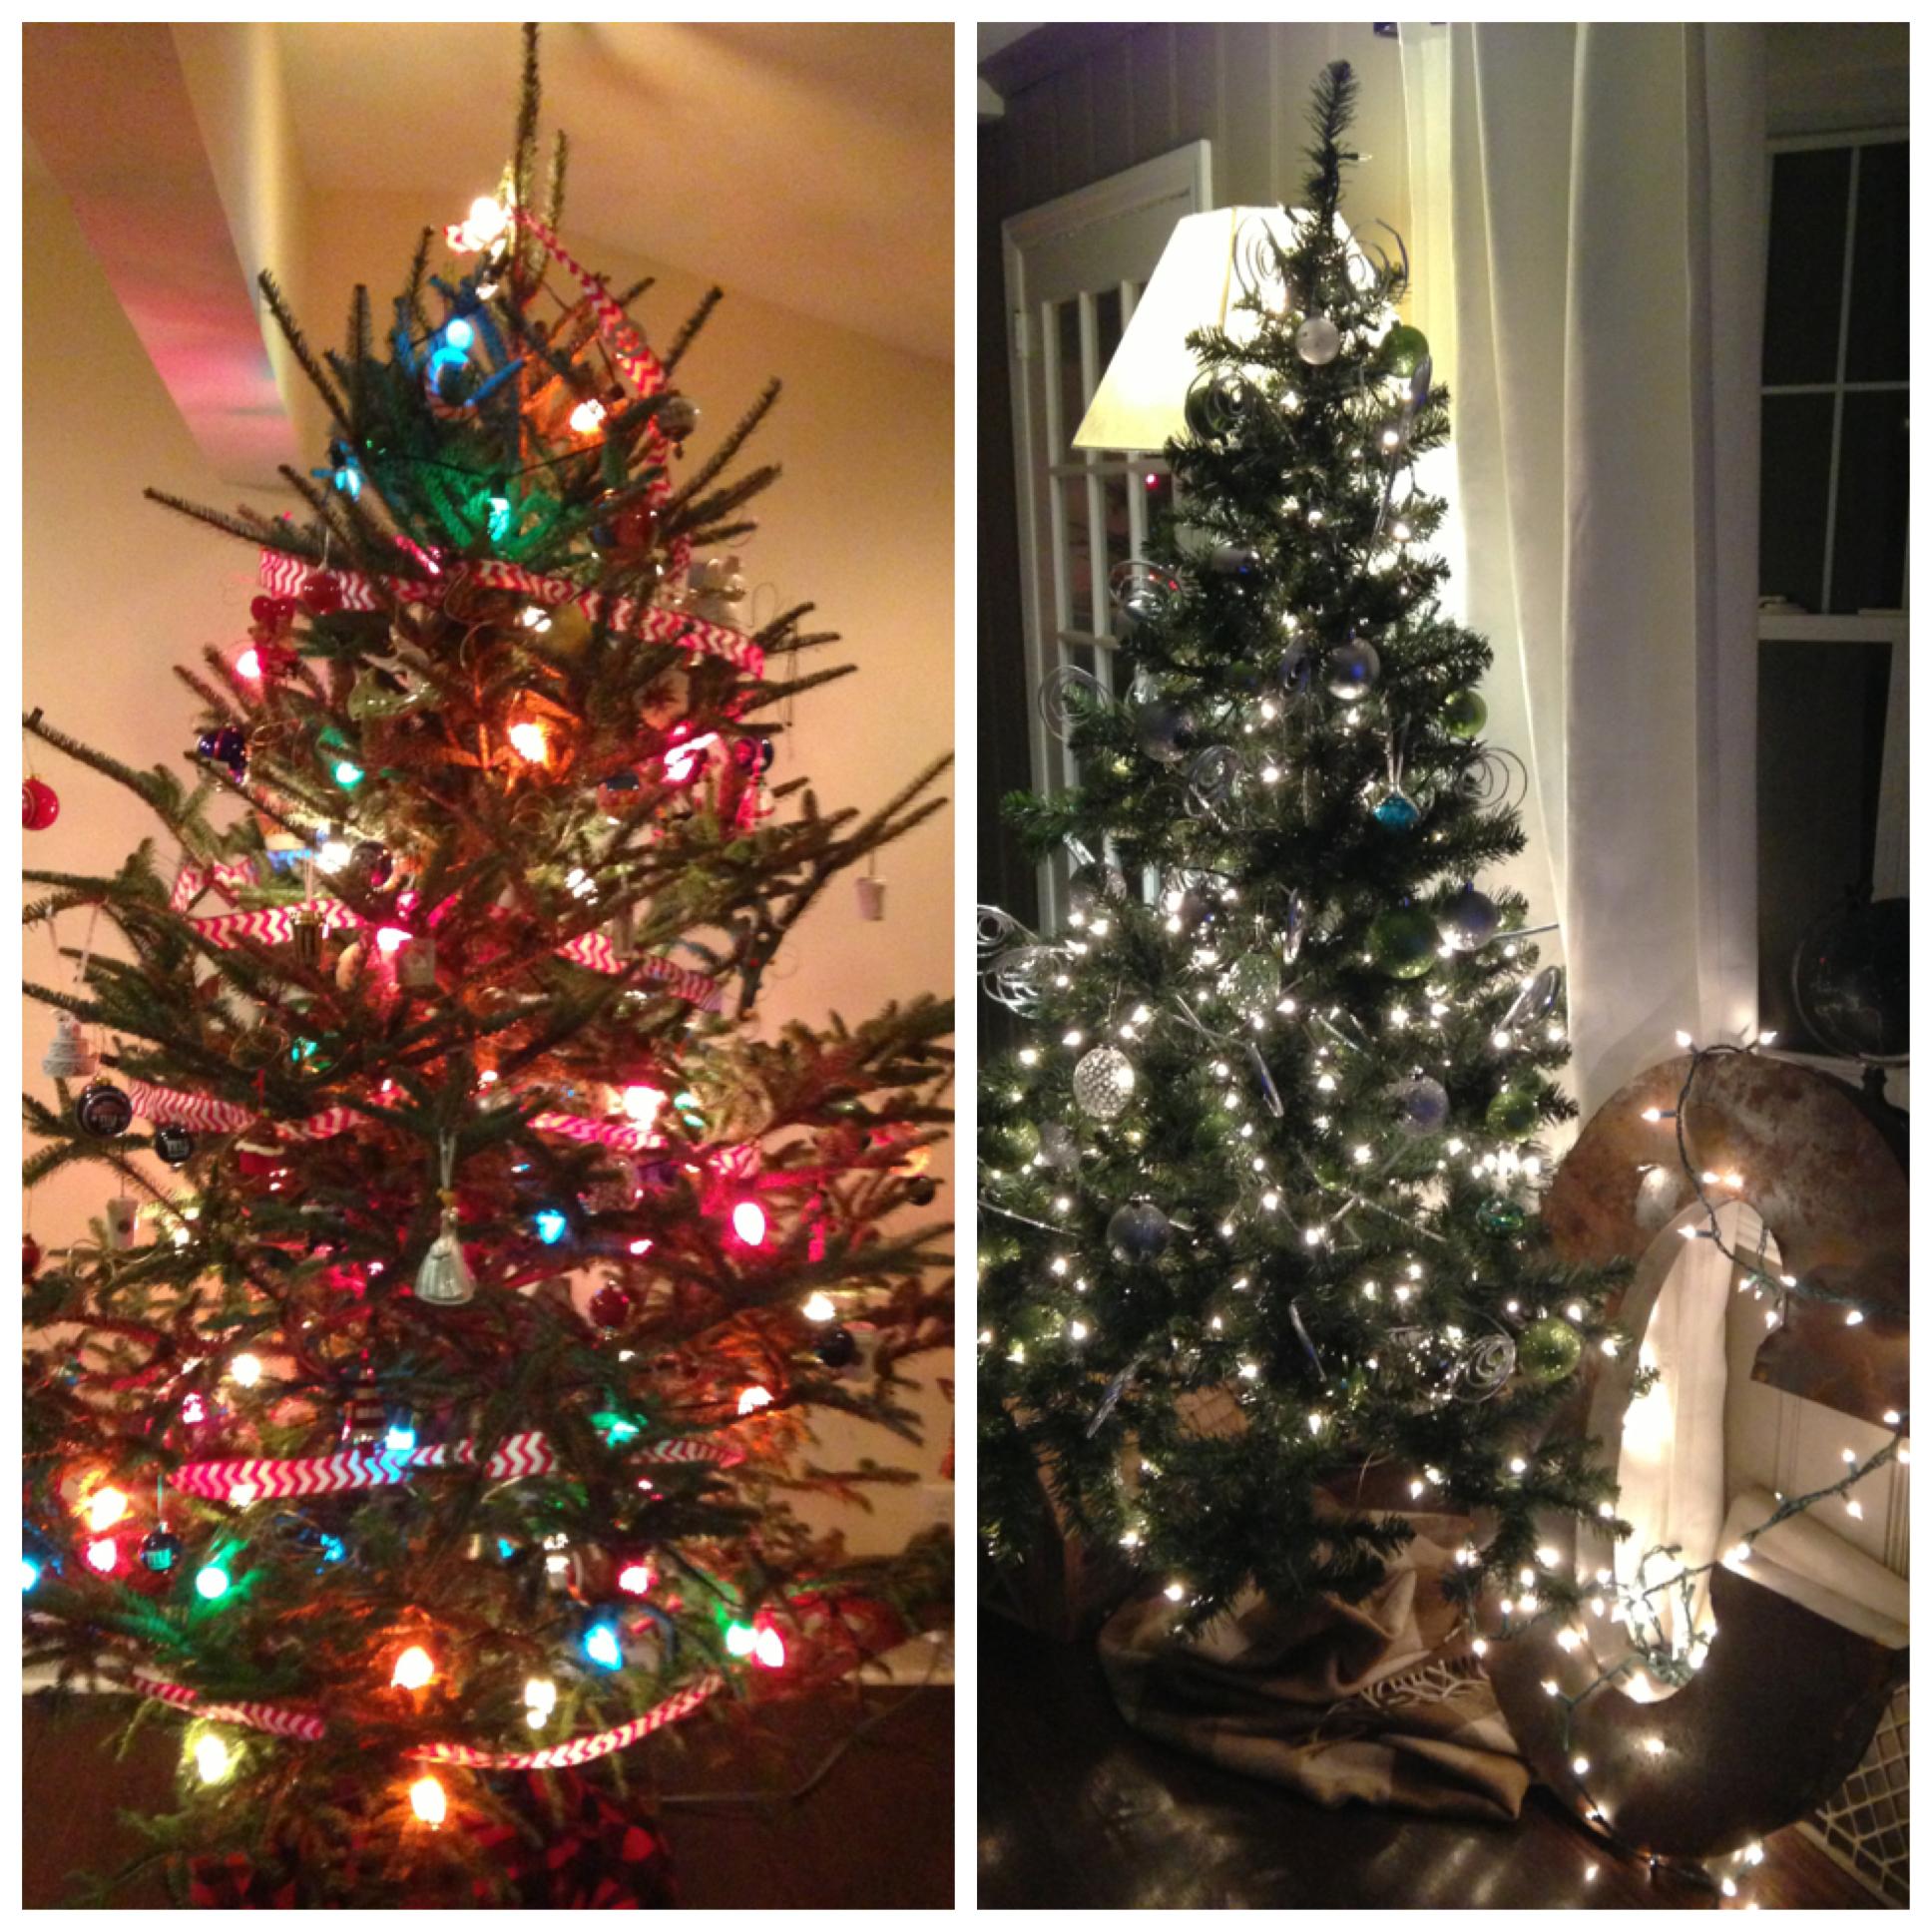 Dueling Christmas Trees.jpg